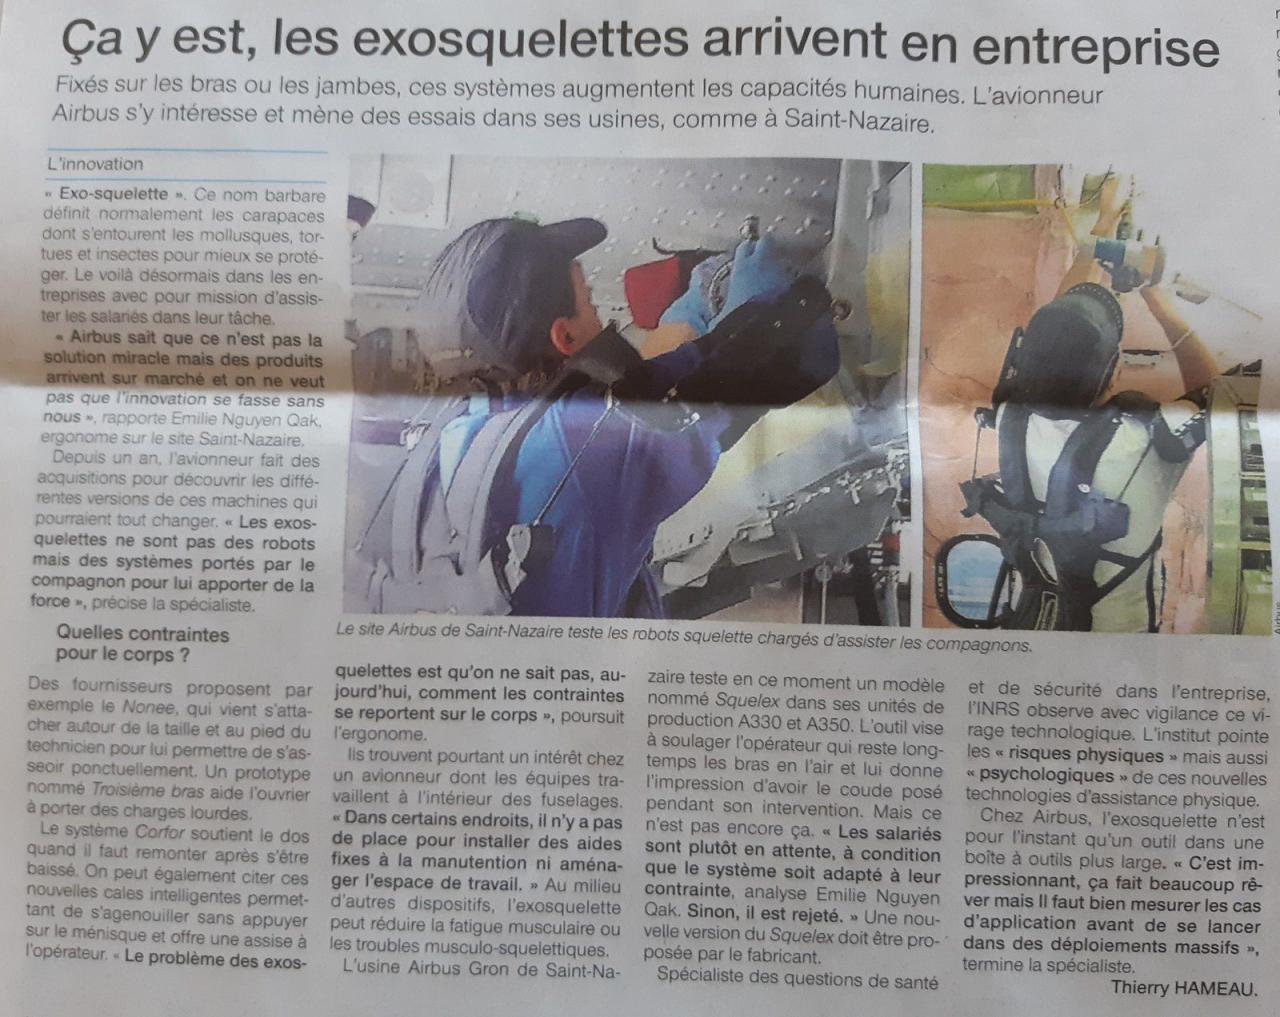 artcile Ouest France 2018 06 25 - exosquelettes